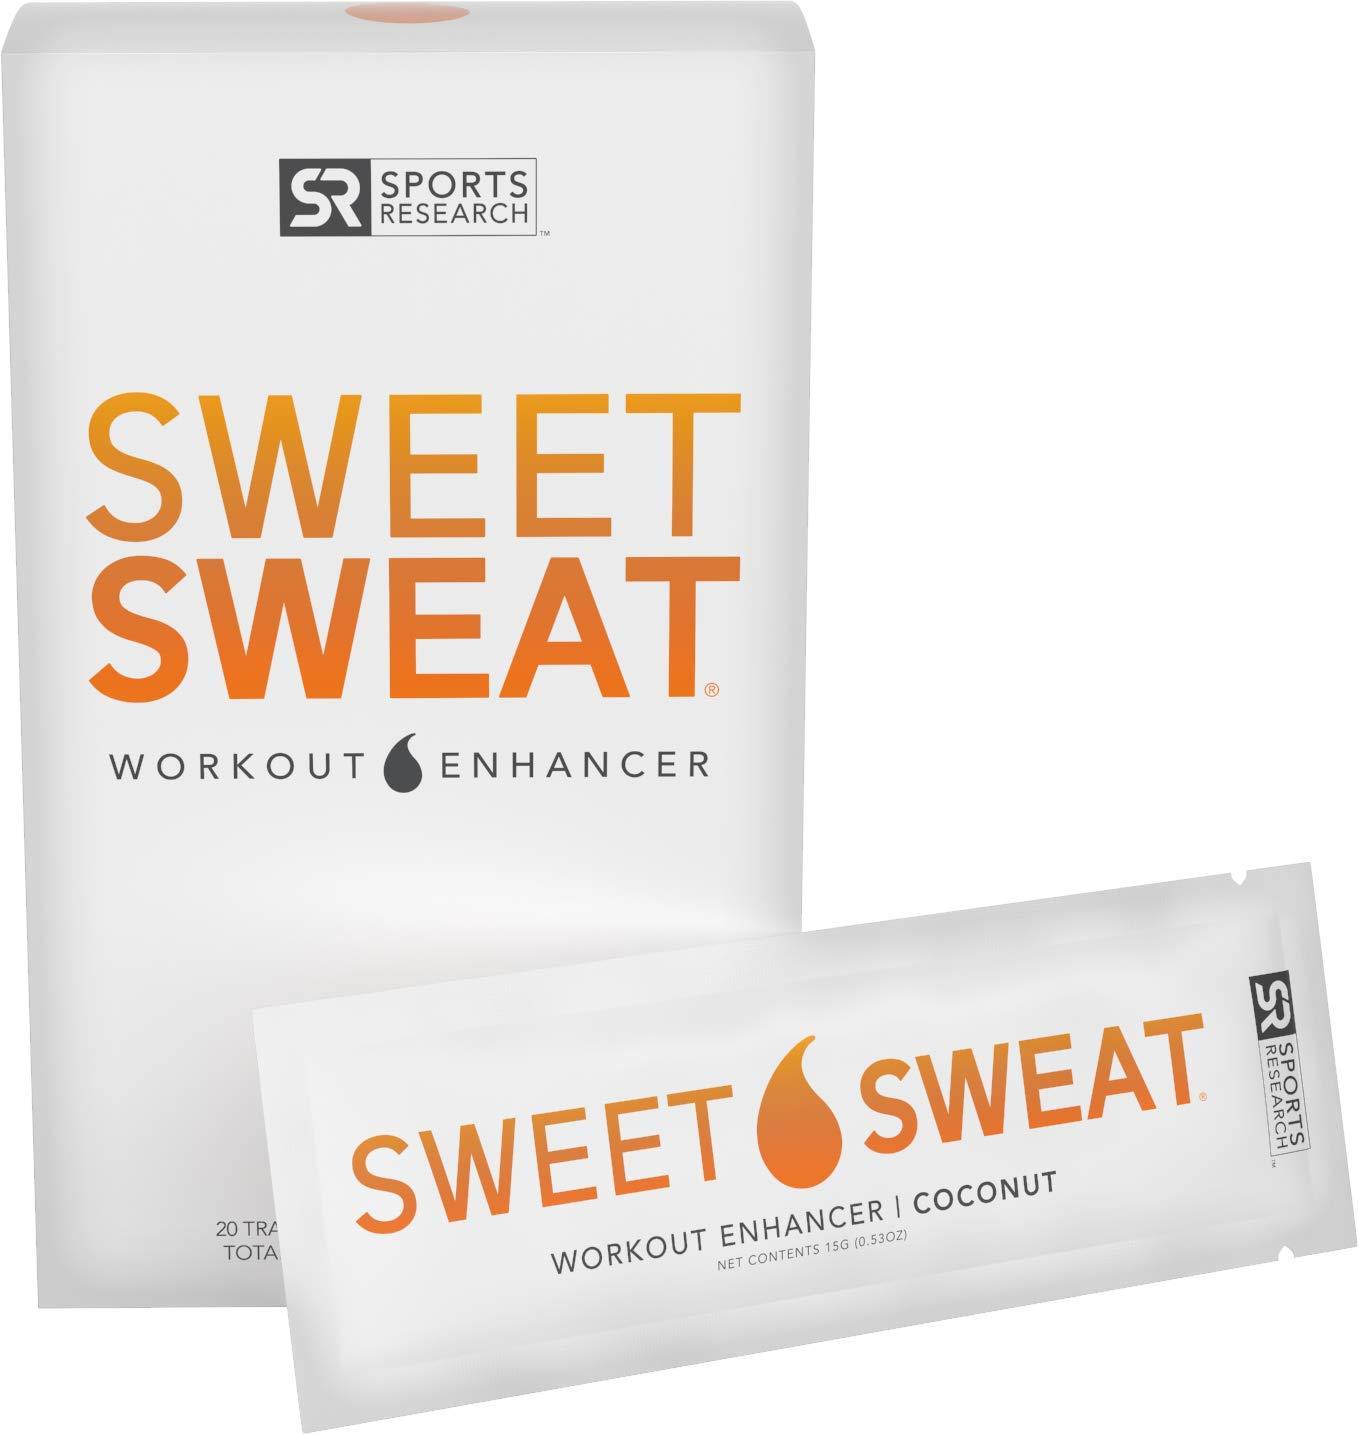 Sweet Sweat Coconut 'Workout Enhancer' Gel Packets - 10.5oz (20 Travel Packets)